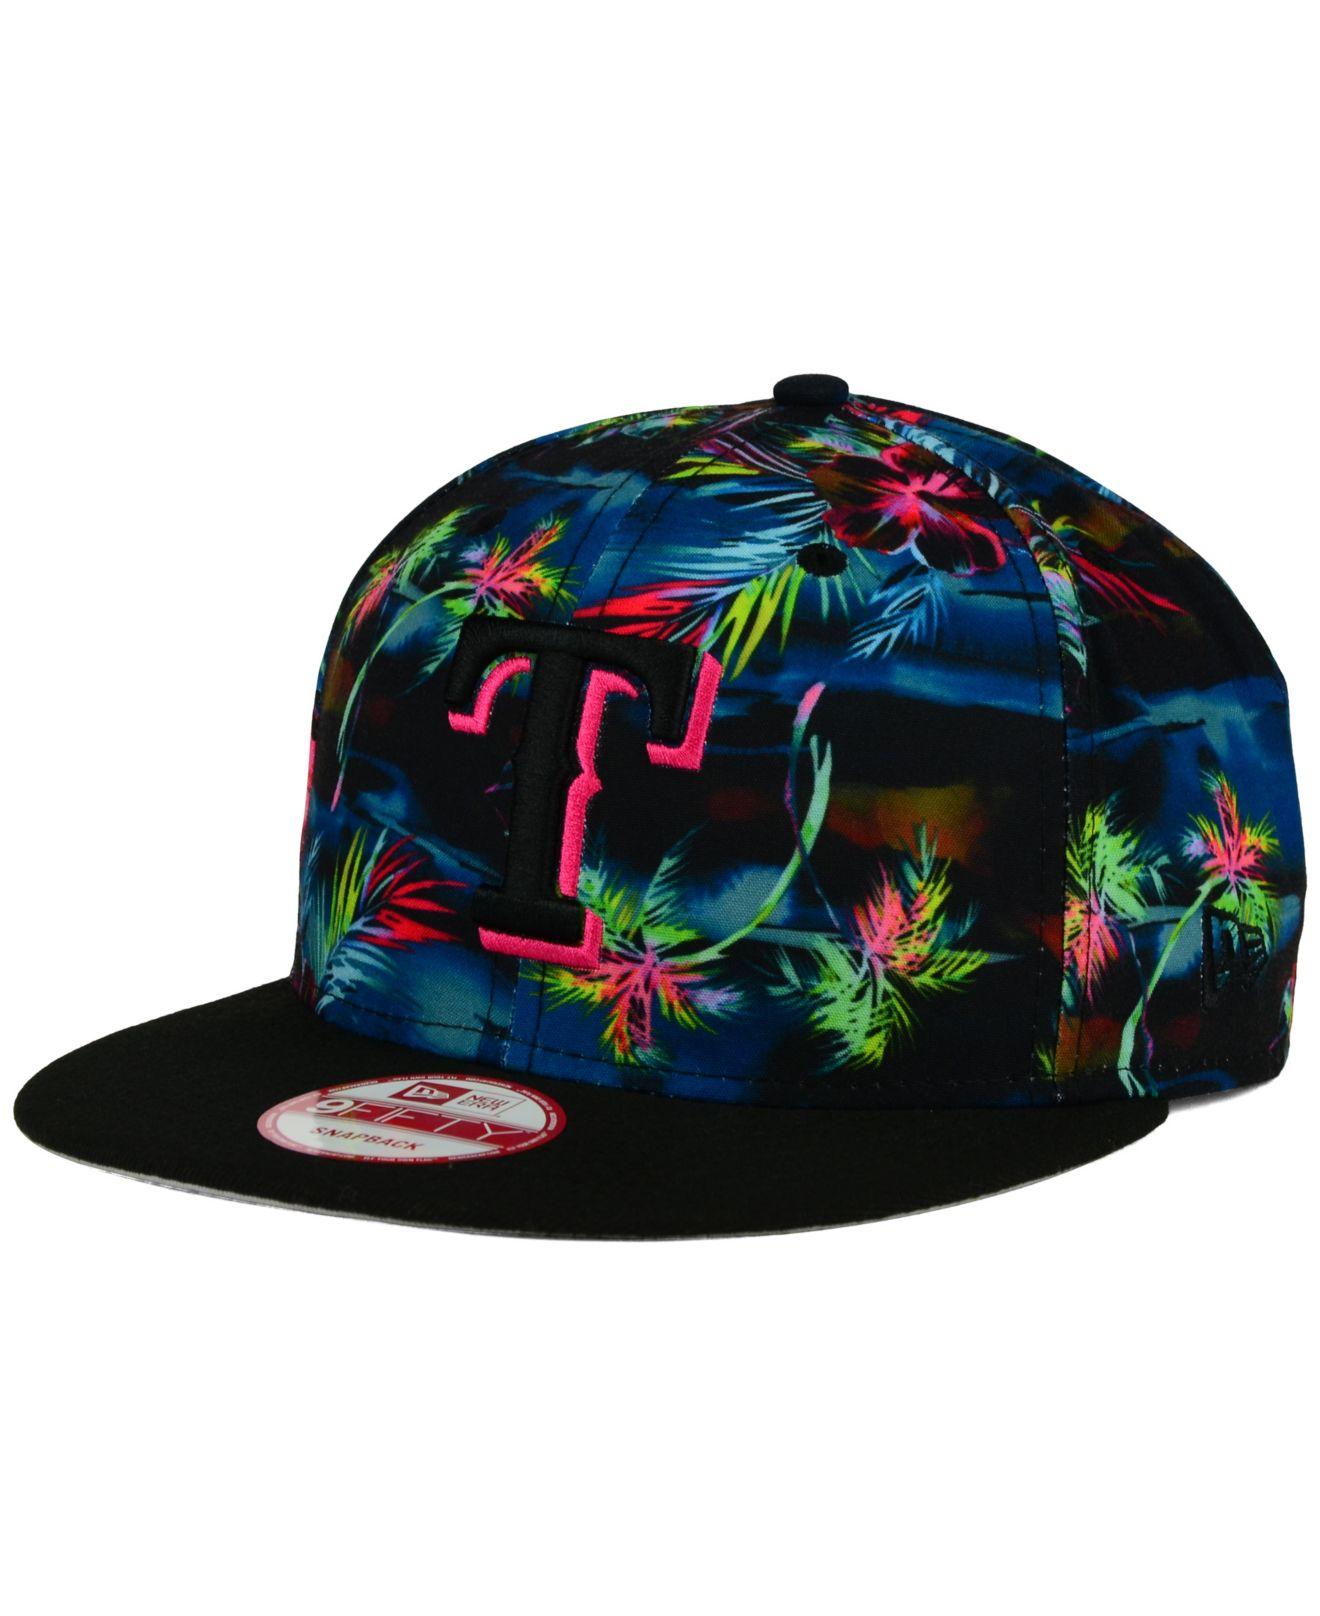 f3881fc2eb0 ... inexpensive lyst ktz texas rangers dark tropic 9fifty snapback cap in  blue for men 23a59 8a6a5